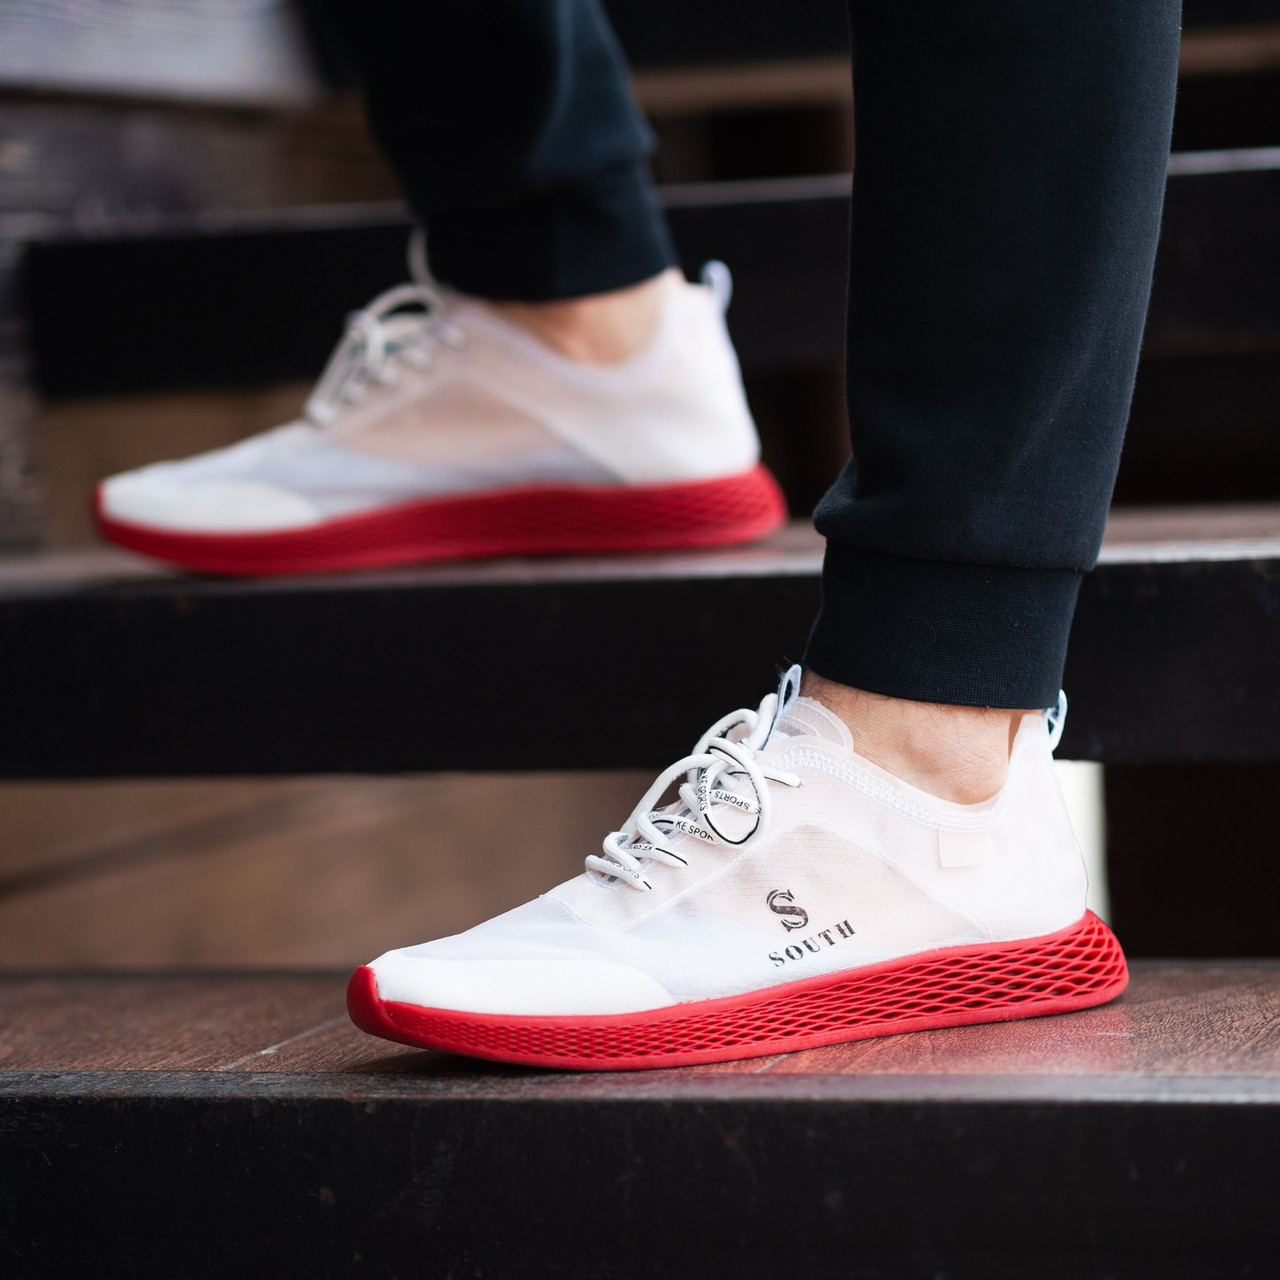 Мужские кроссовки South Sirius WHITE/RED. Текстиль